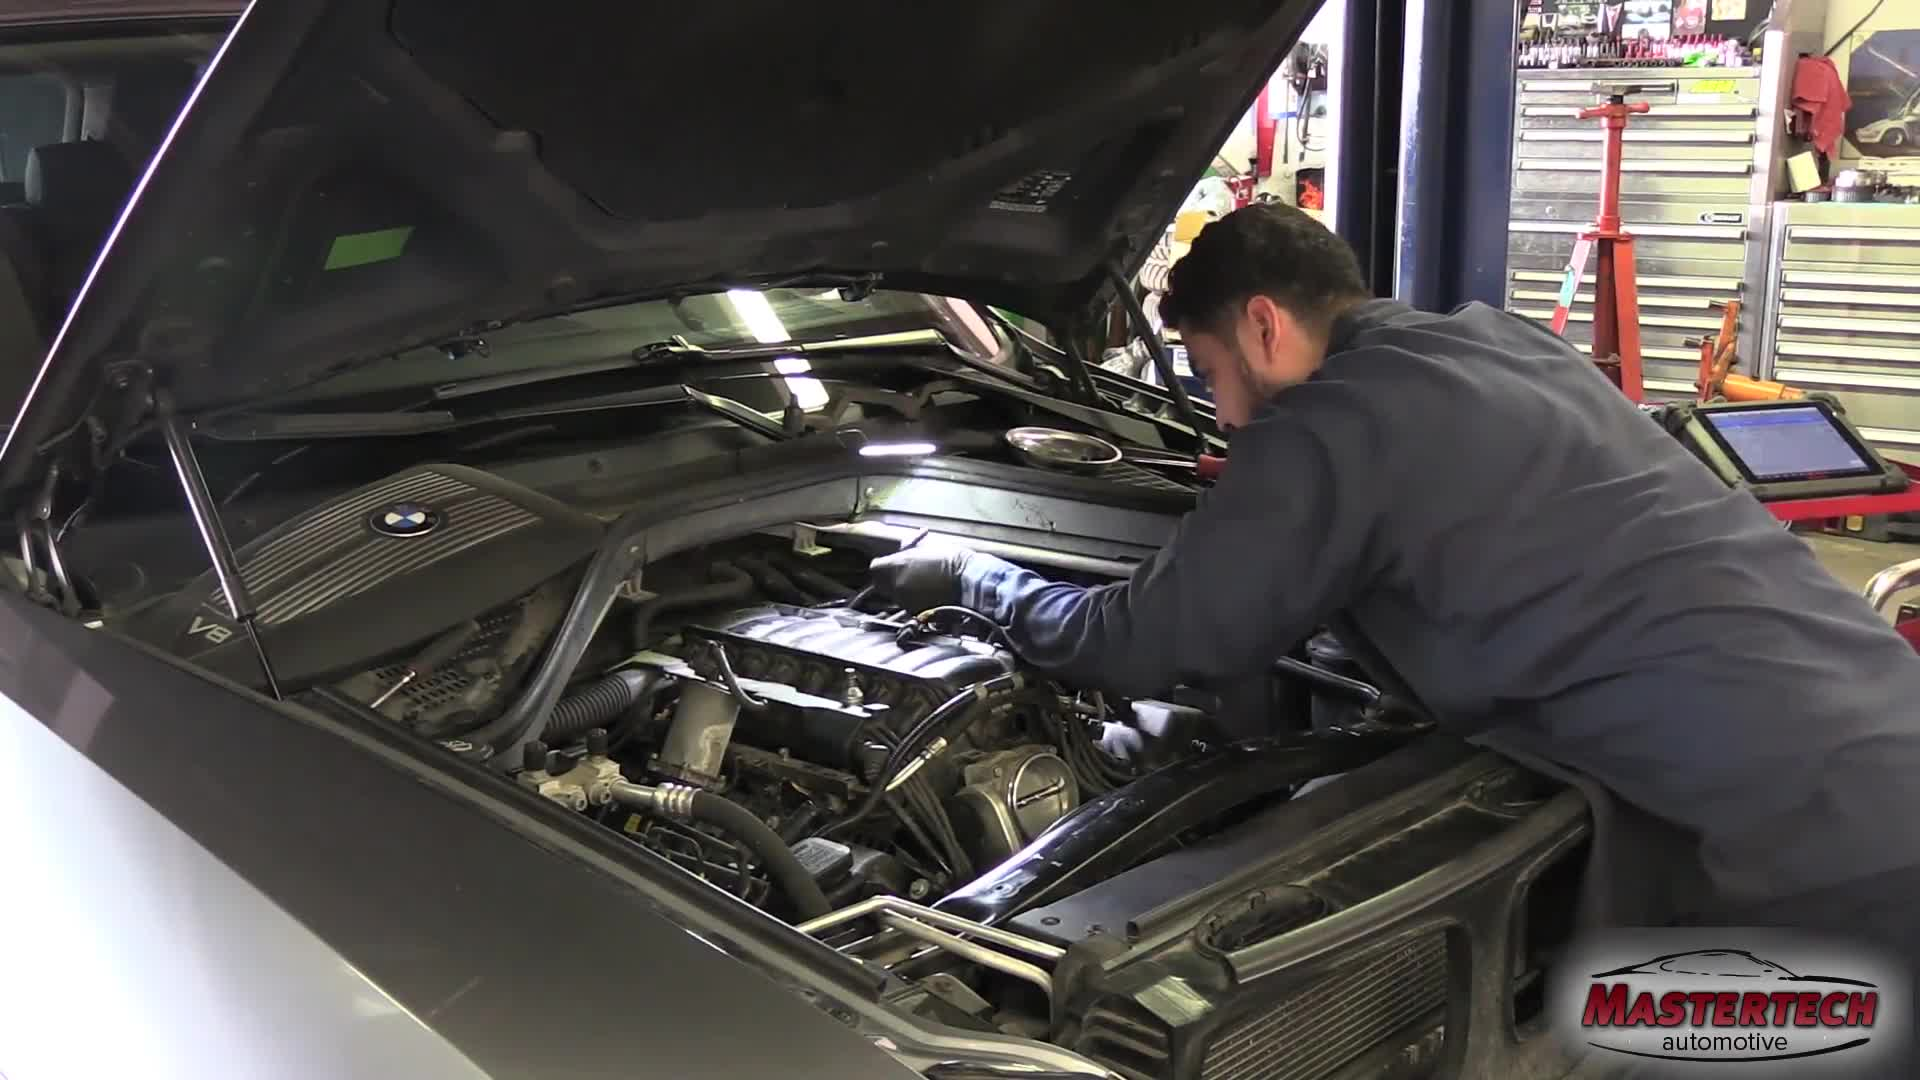 Mastertech Automotive - Auto Repair Garages - 4164447839